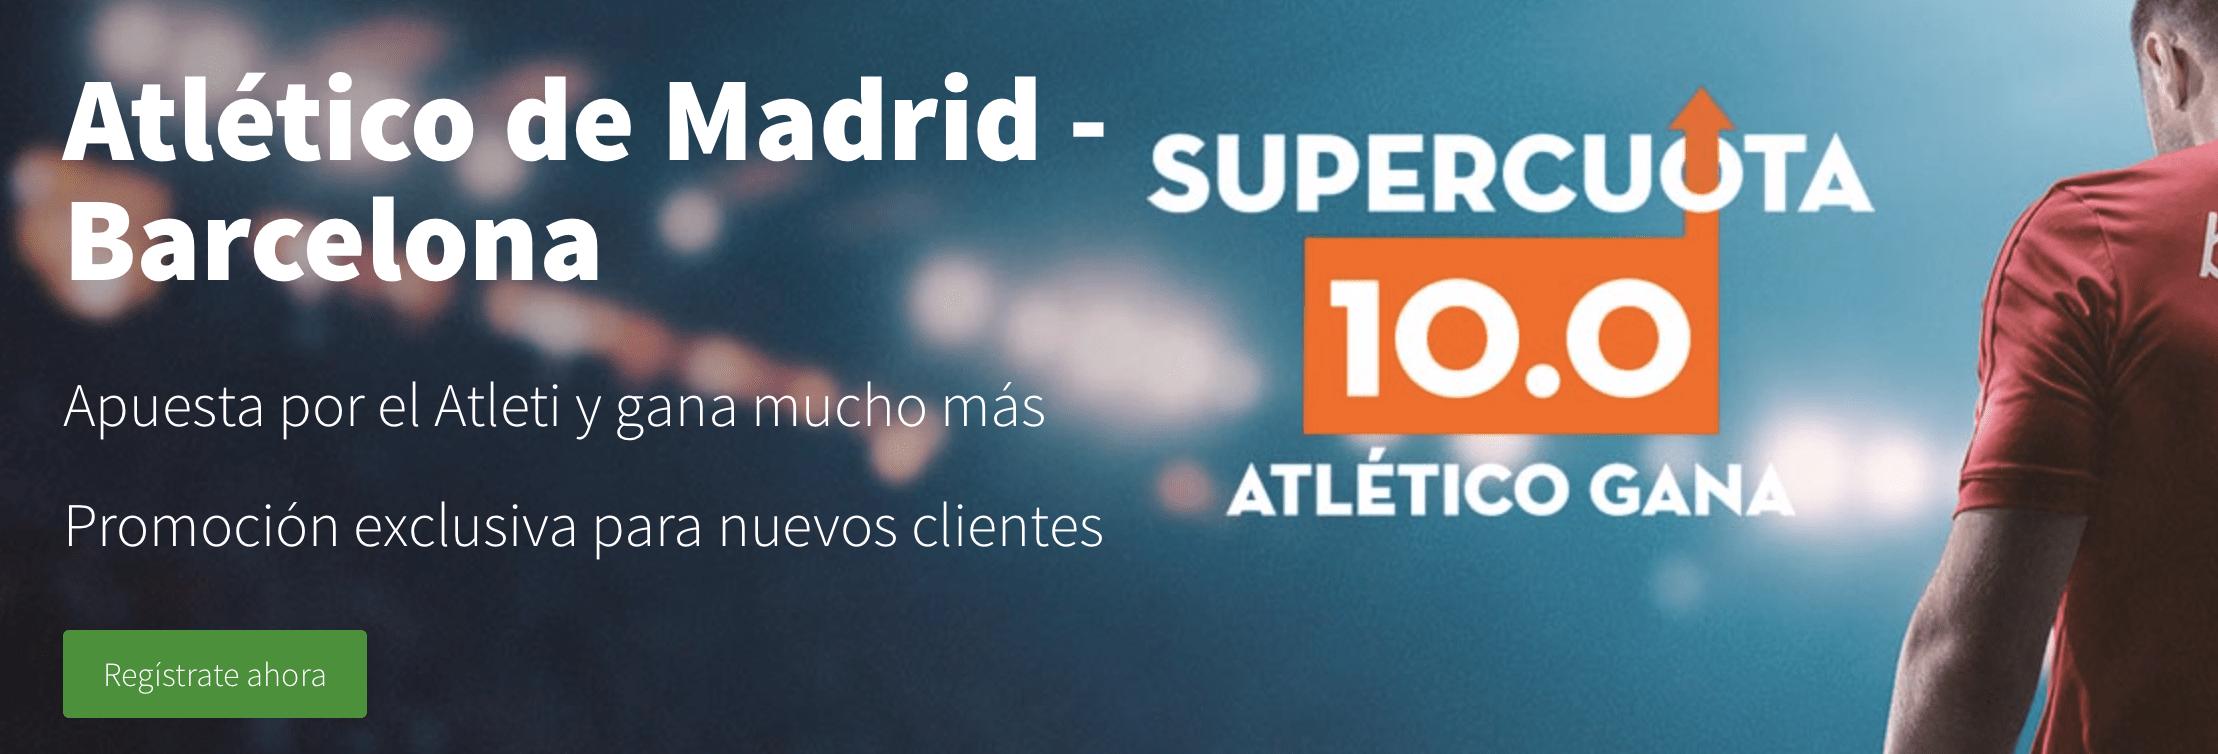 Supercuotas Betsson Atletico de Madrid - FC Barcelona